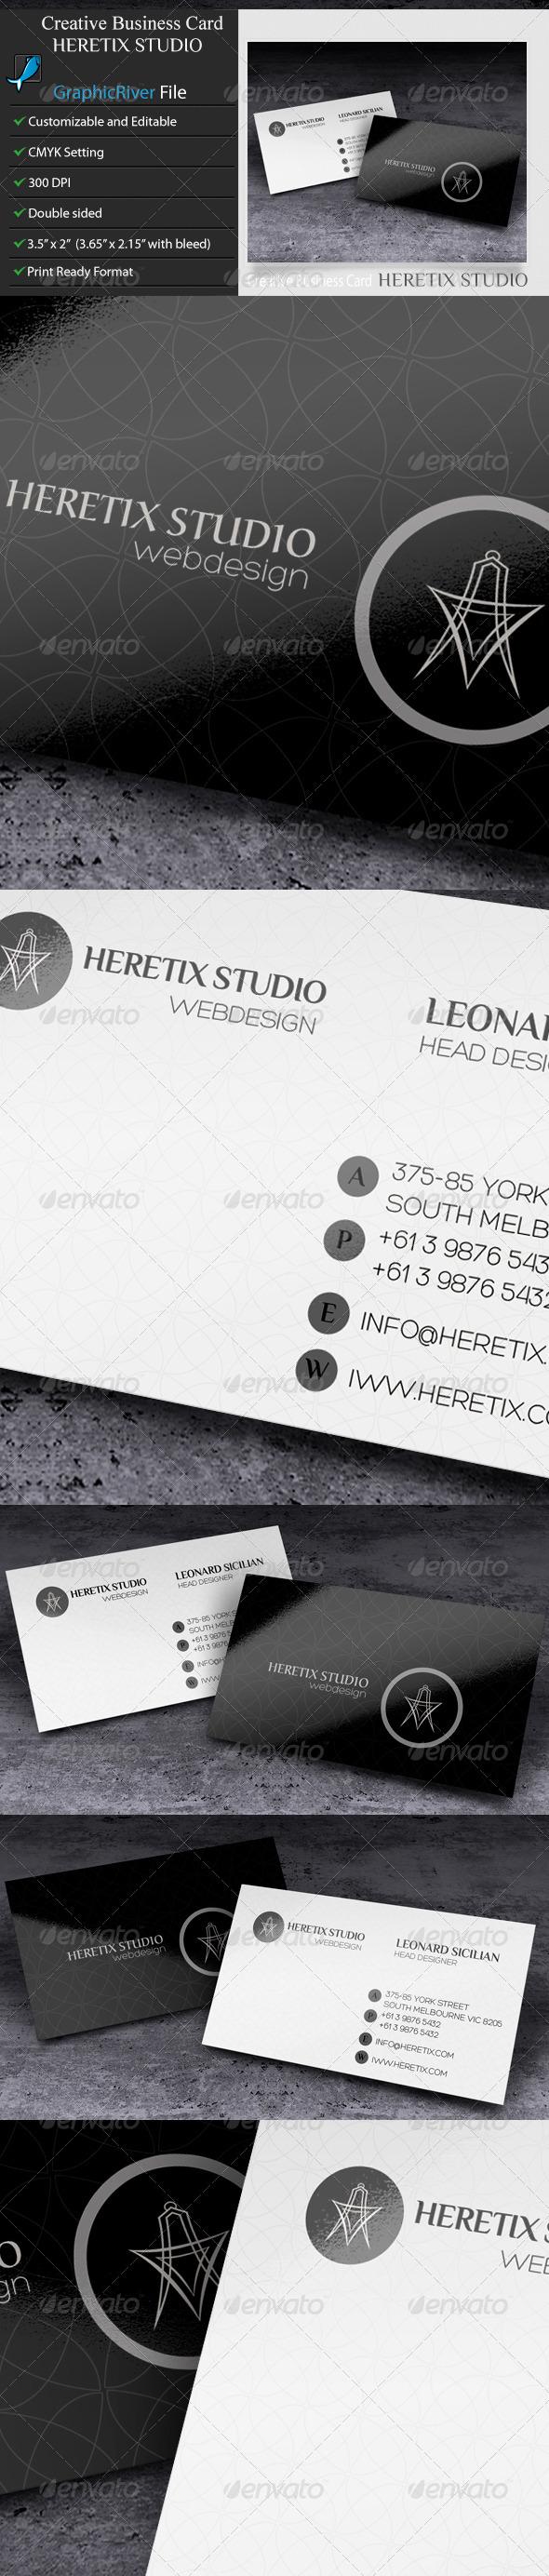 GraphicRiver Business Card Heretix Studio 6503451